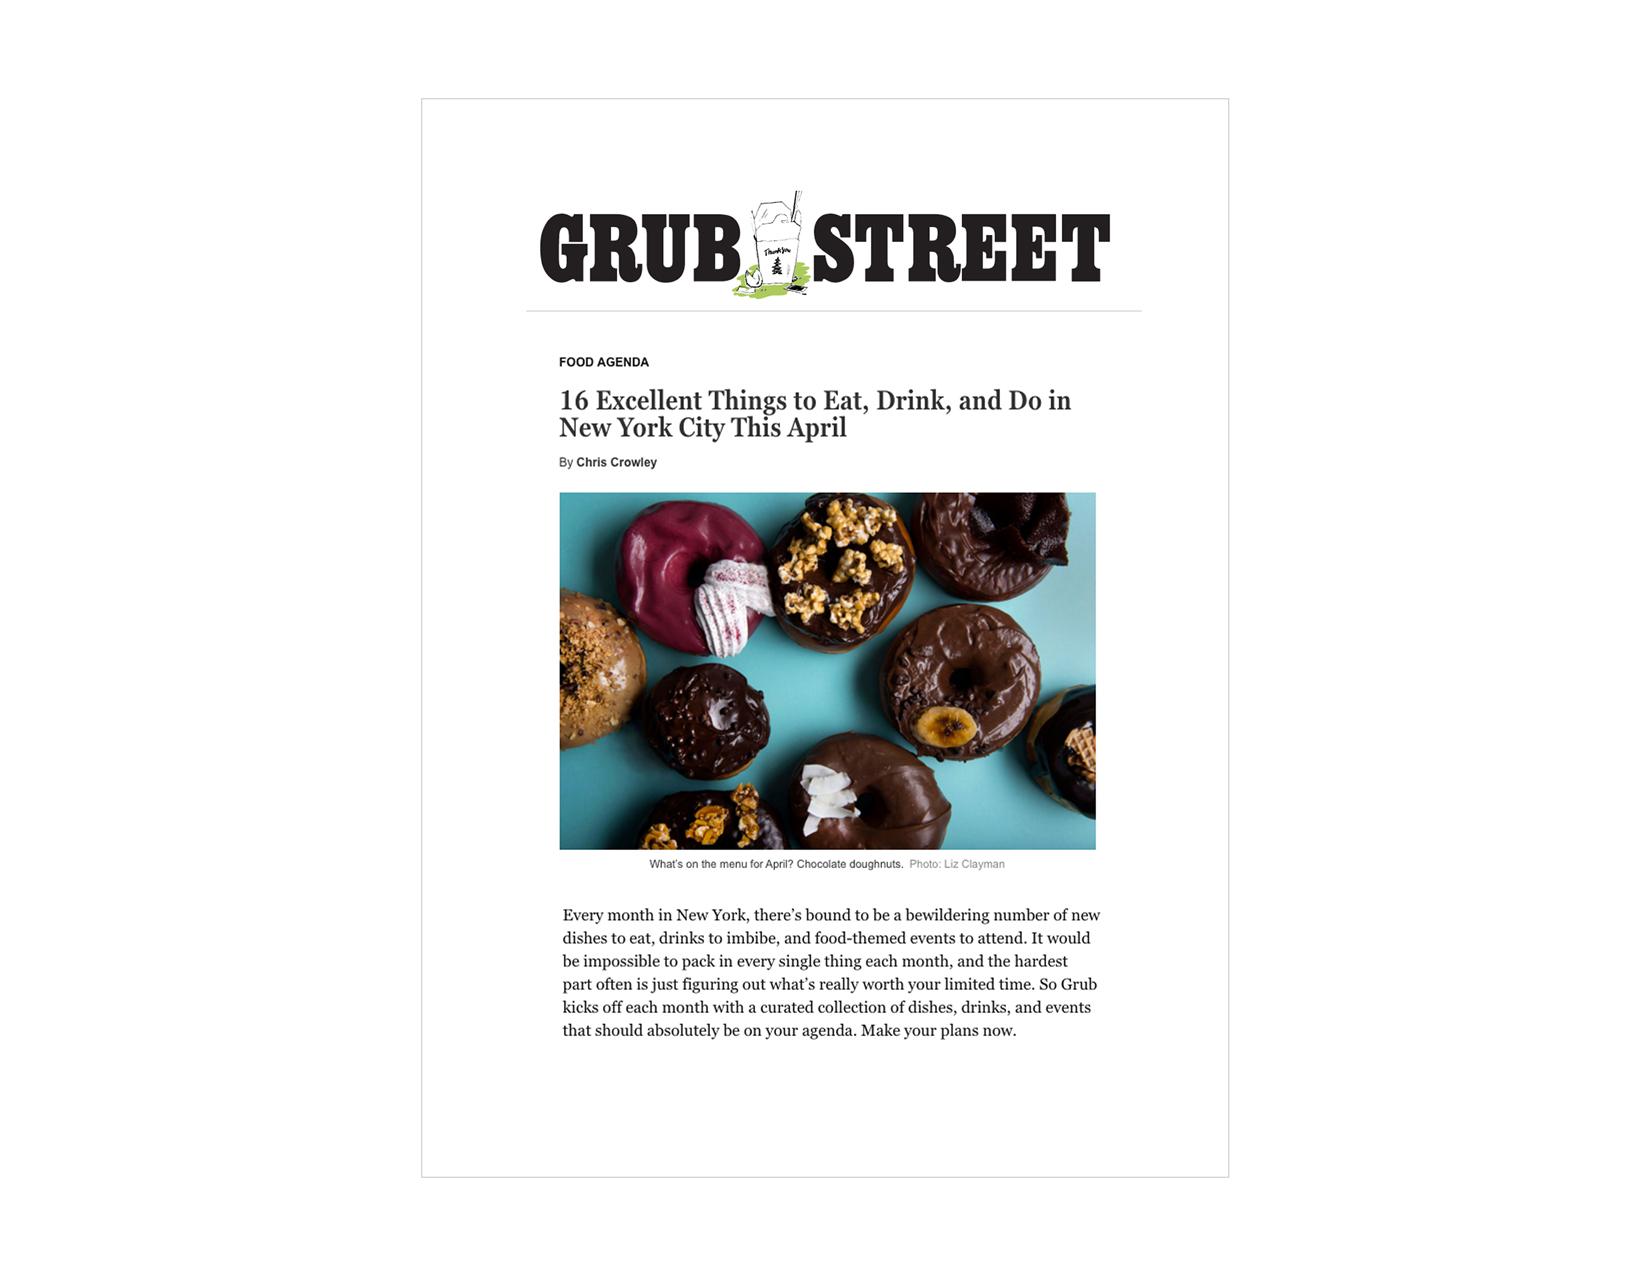 OurWork-Grubstreet.jpg